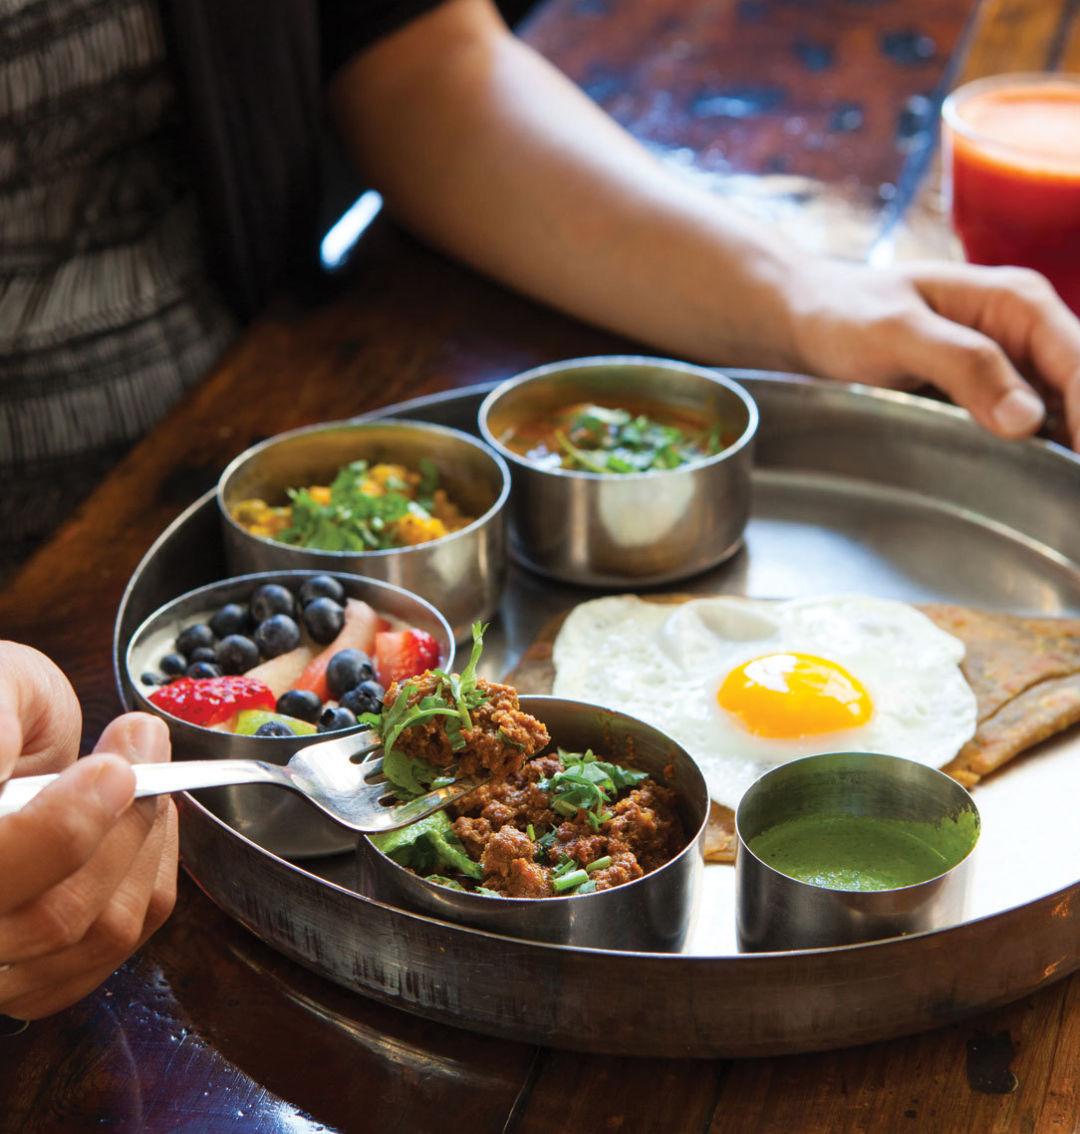 0515 best breakfasts pondicheri morning thali xmoqrr